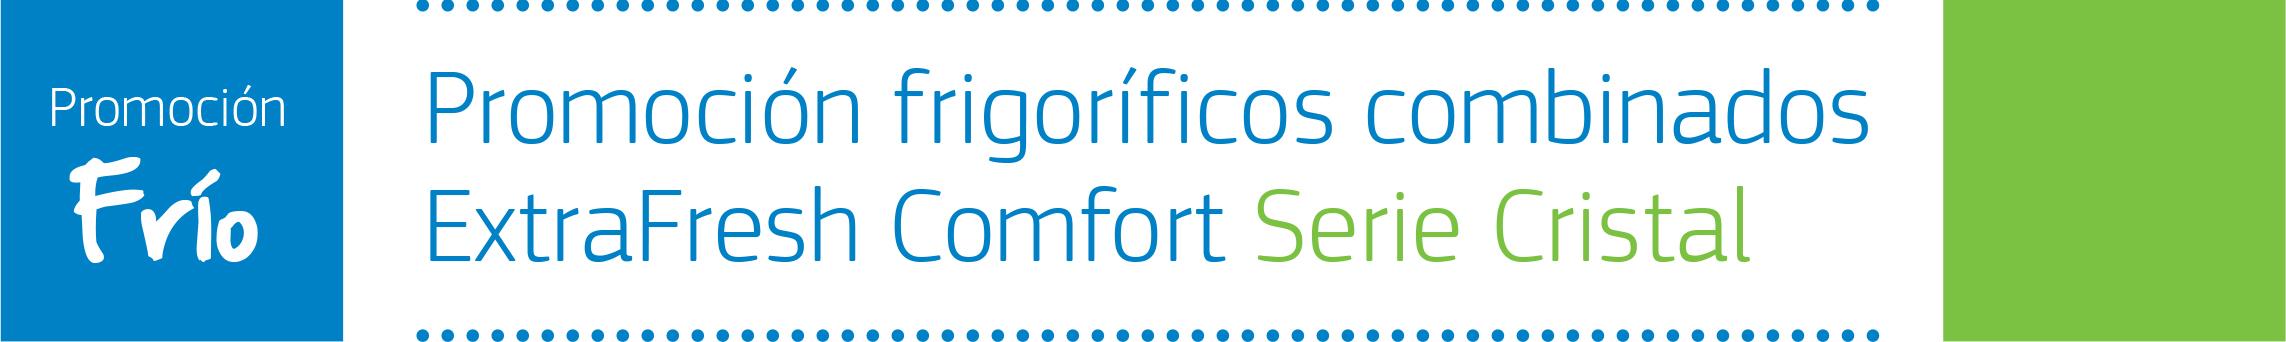 Promoción frigoríficos combinados ExtraFresh Comfort Serie Cristal